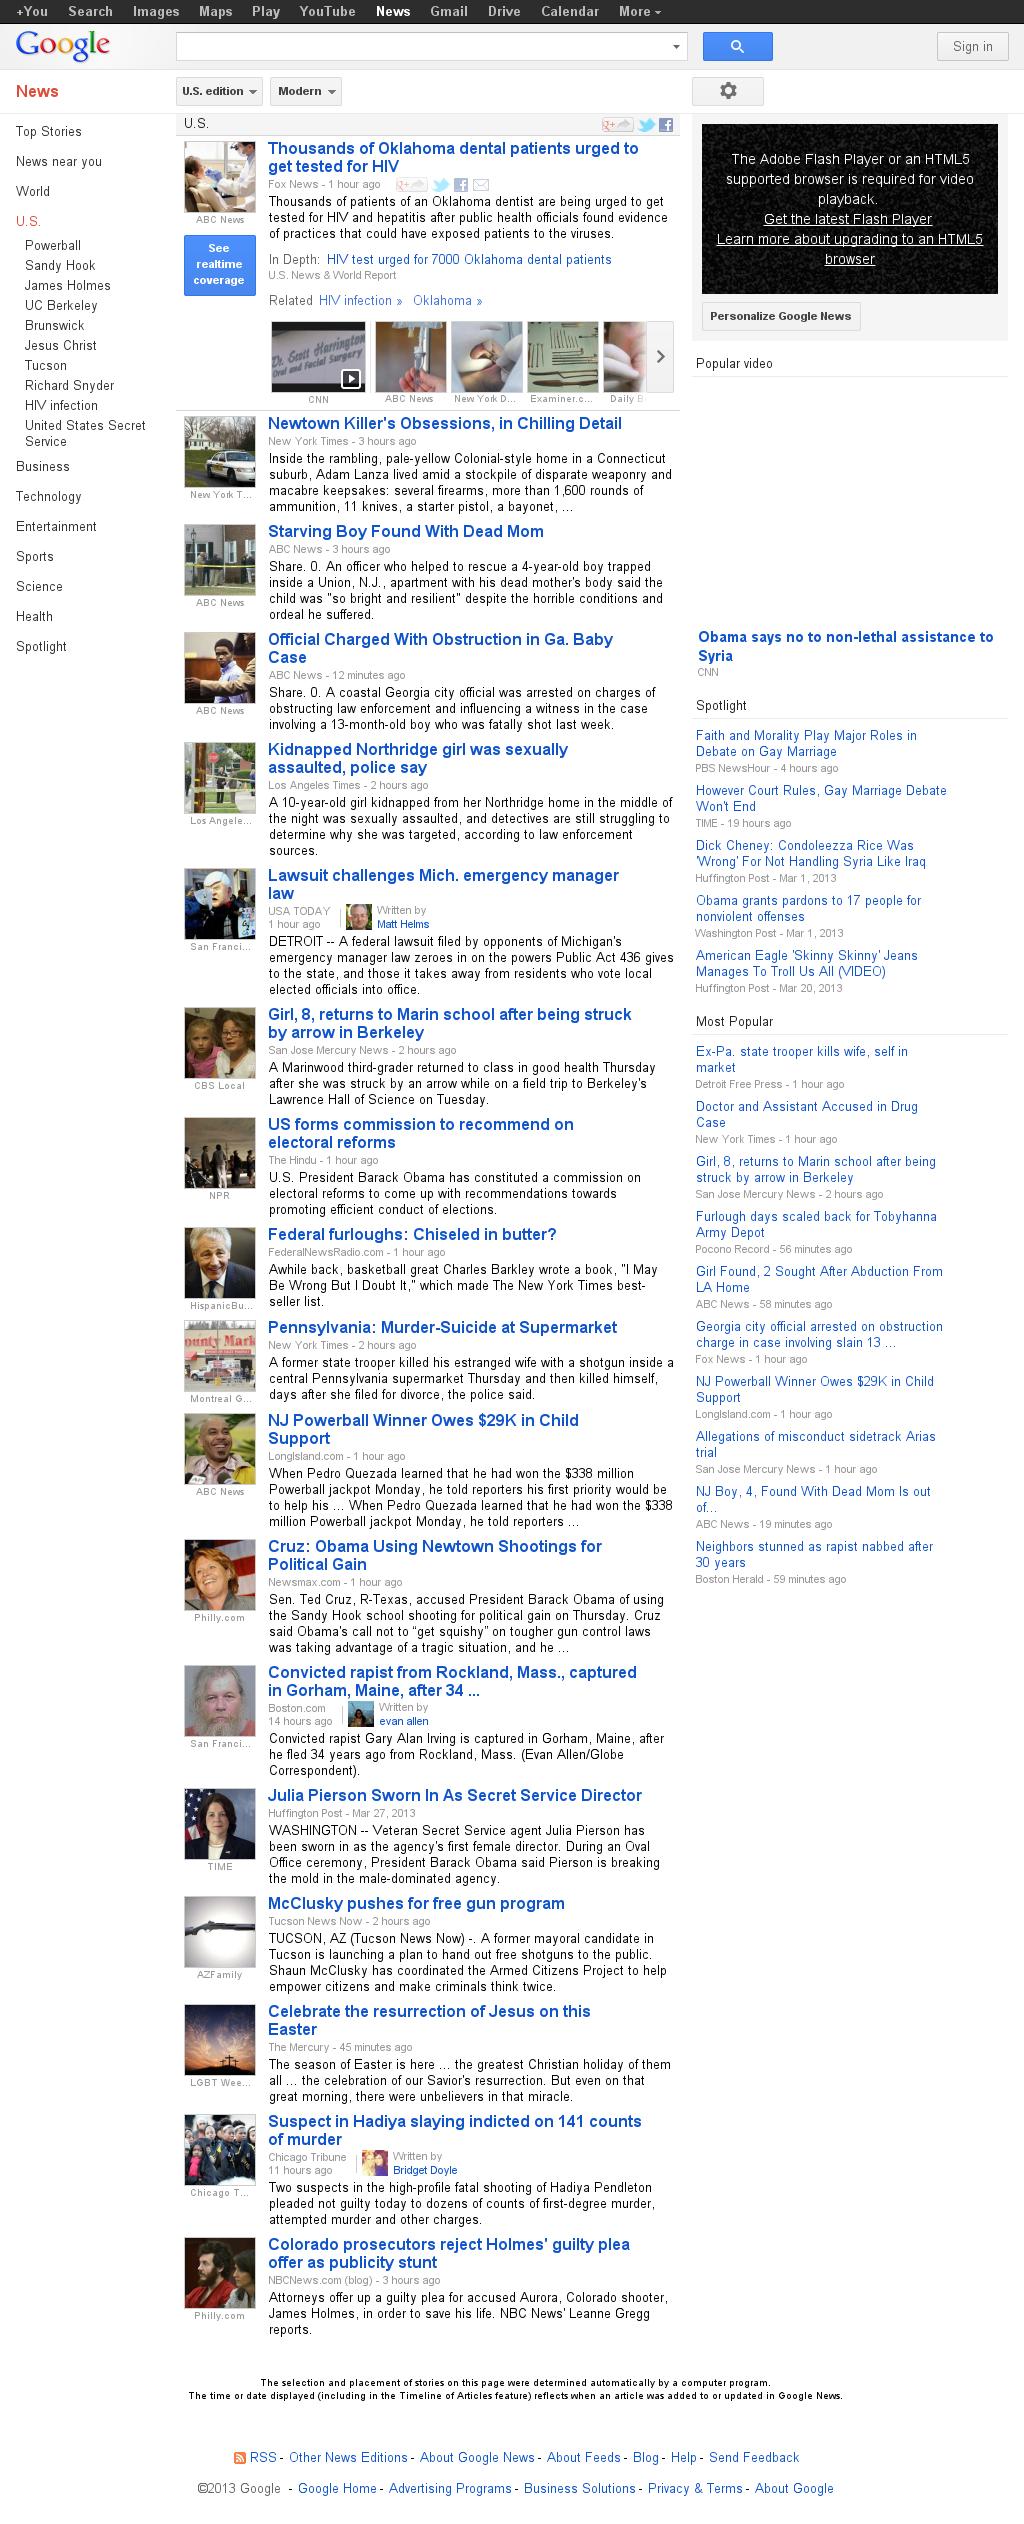 Google News: U.S. at Friday March 29, 2013, 5:09 a.m. UTC